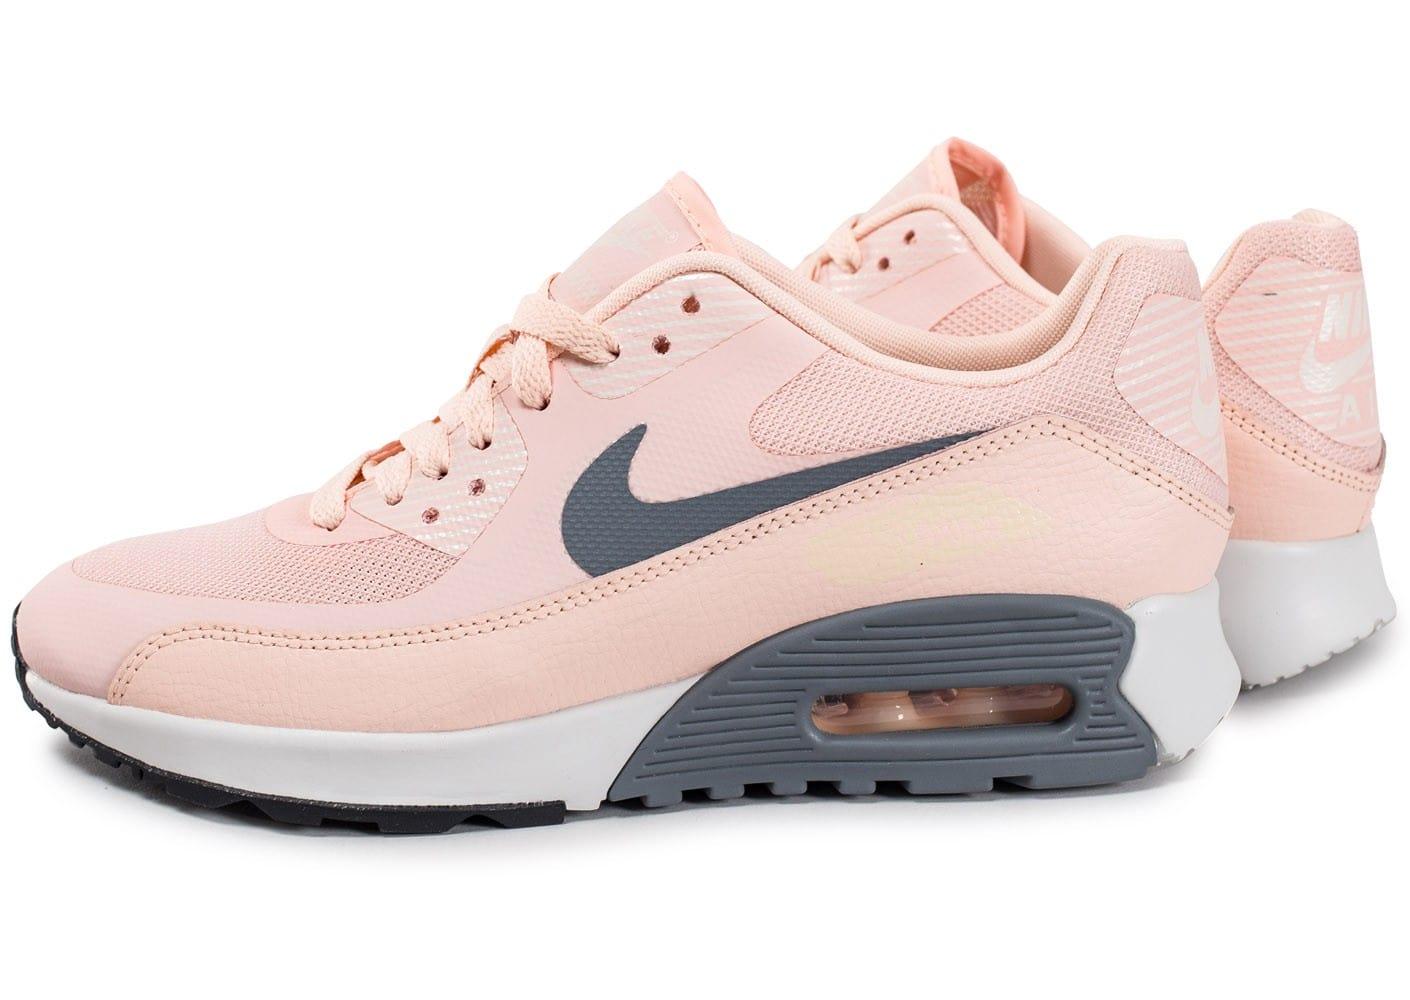 detailed look e116f 7bacf Officiel Remise Nike Air Max 90 Femme Chaussures De Fitness  Thomasboutique OIO185421971  chaussure air max femme bleu,femme air max 90  essential bleu,nike ...